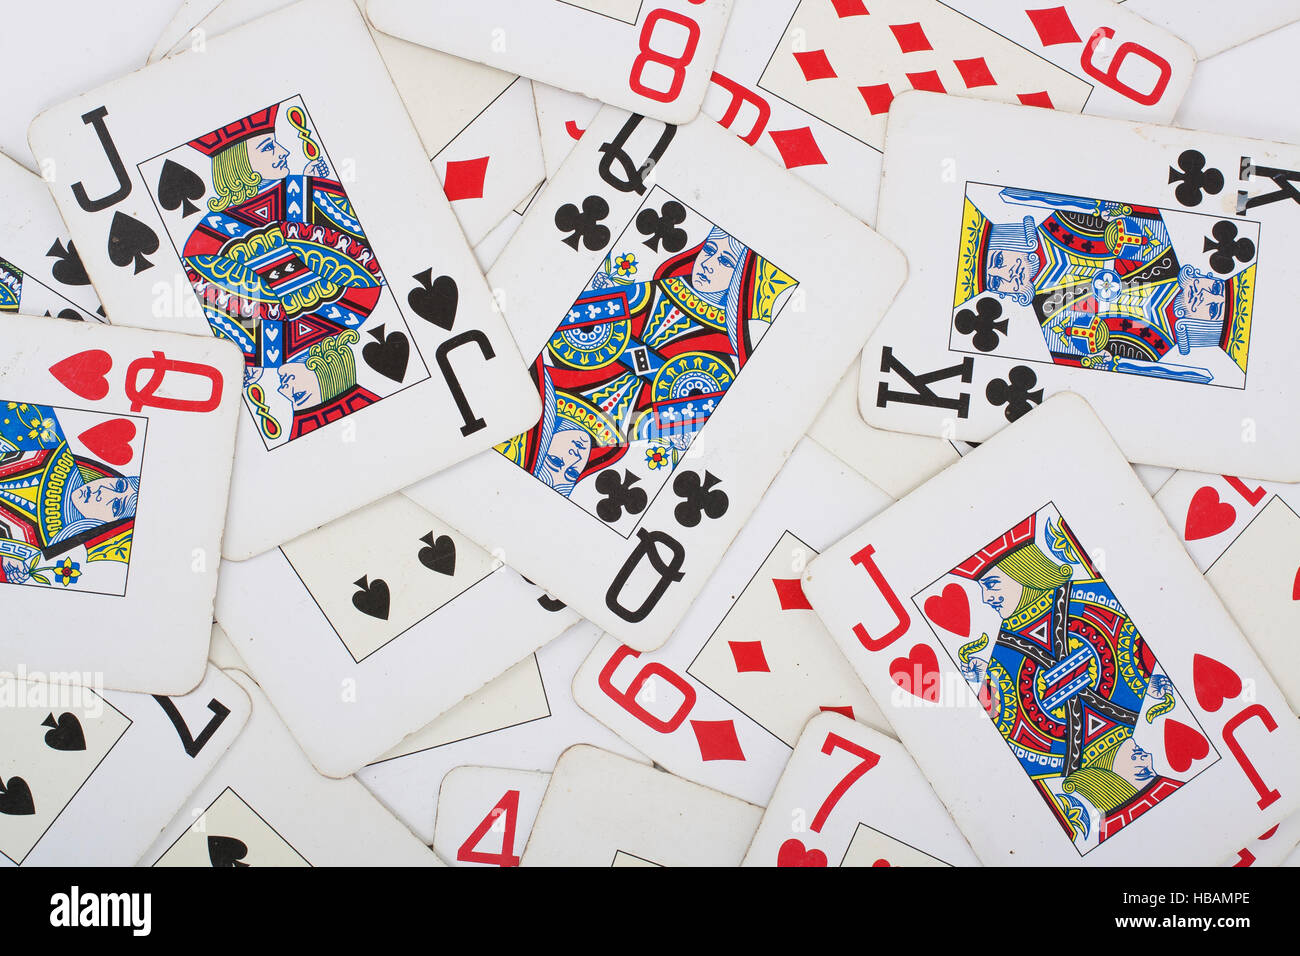 Blackjack with multiple decks